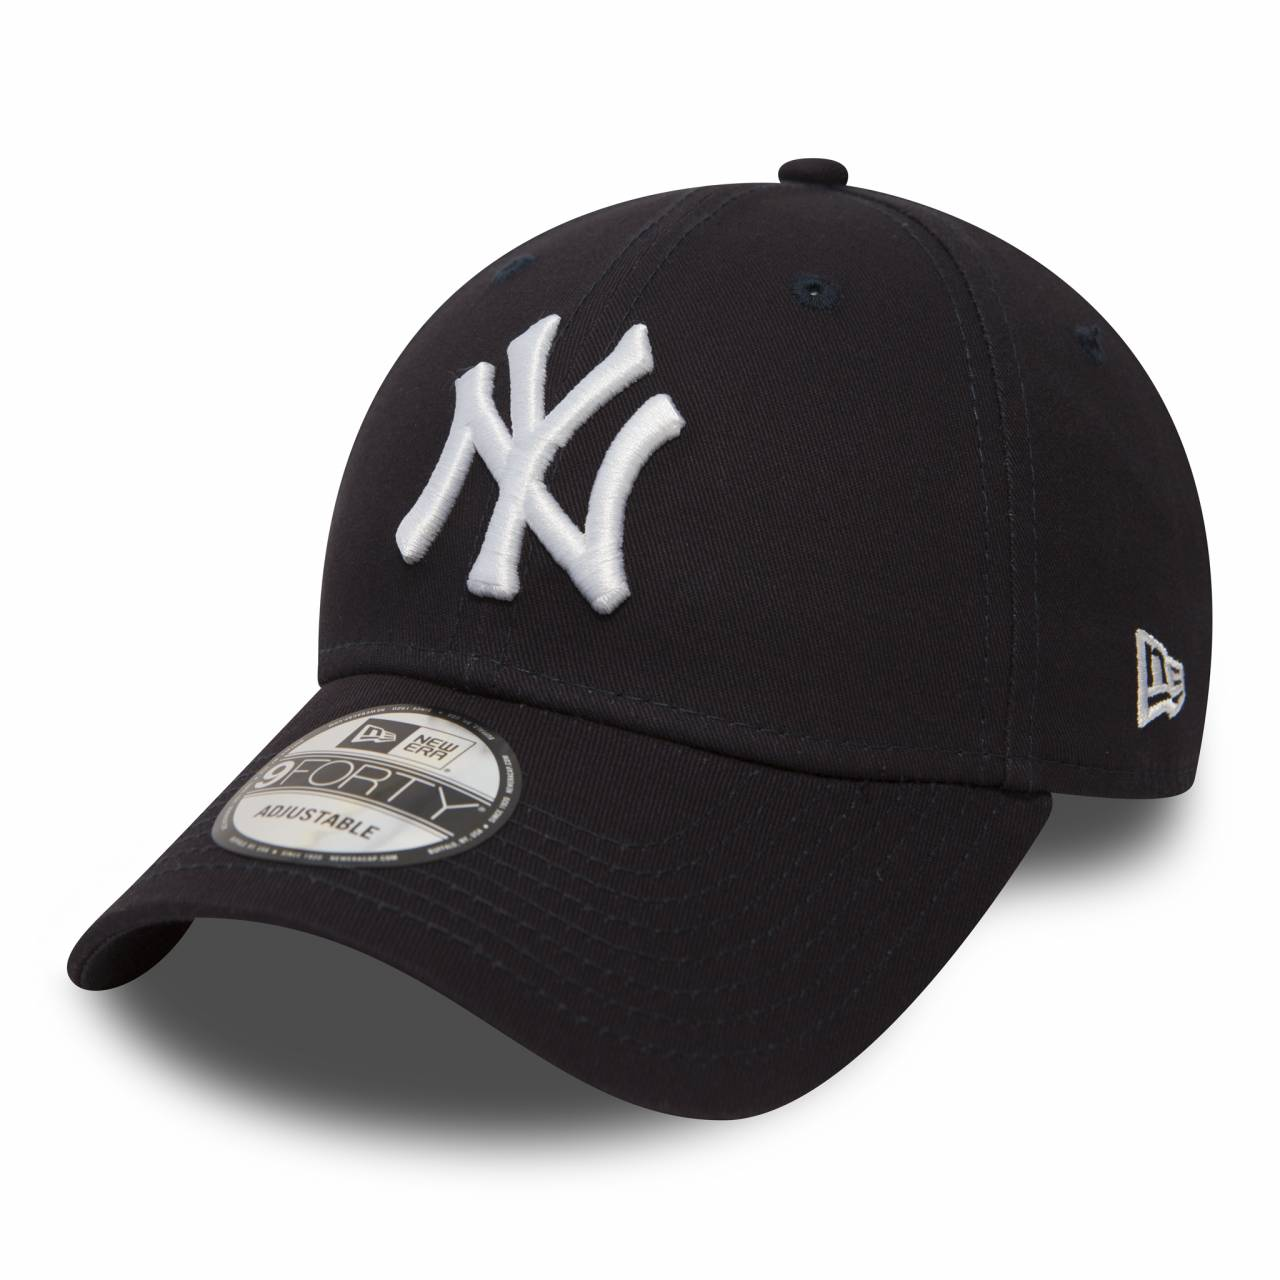 10531939 9FORTY NEW YORK YANKEES NAVY/WHITE CAP